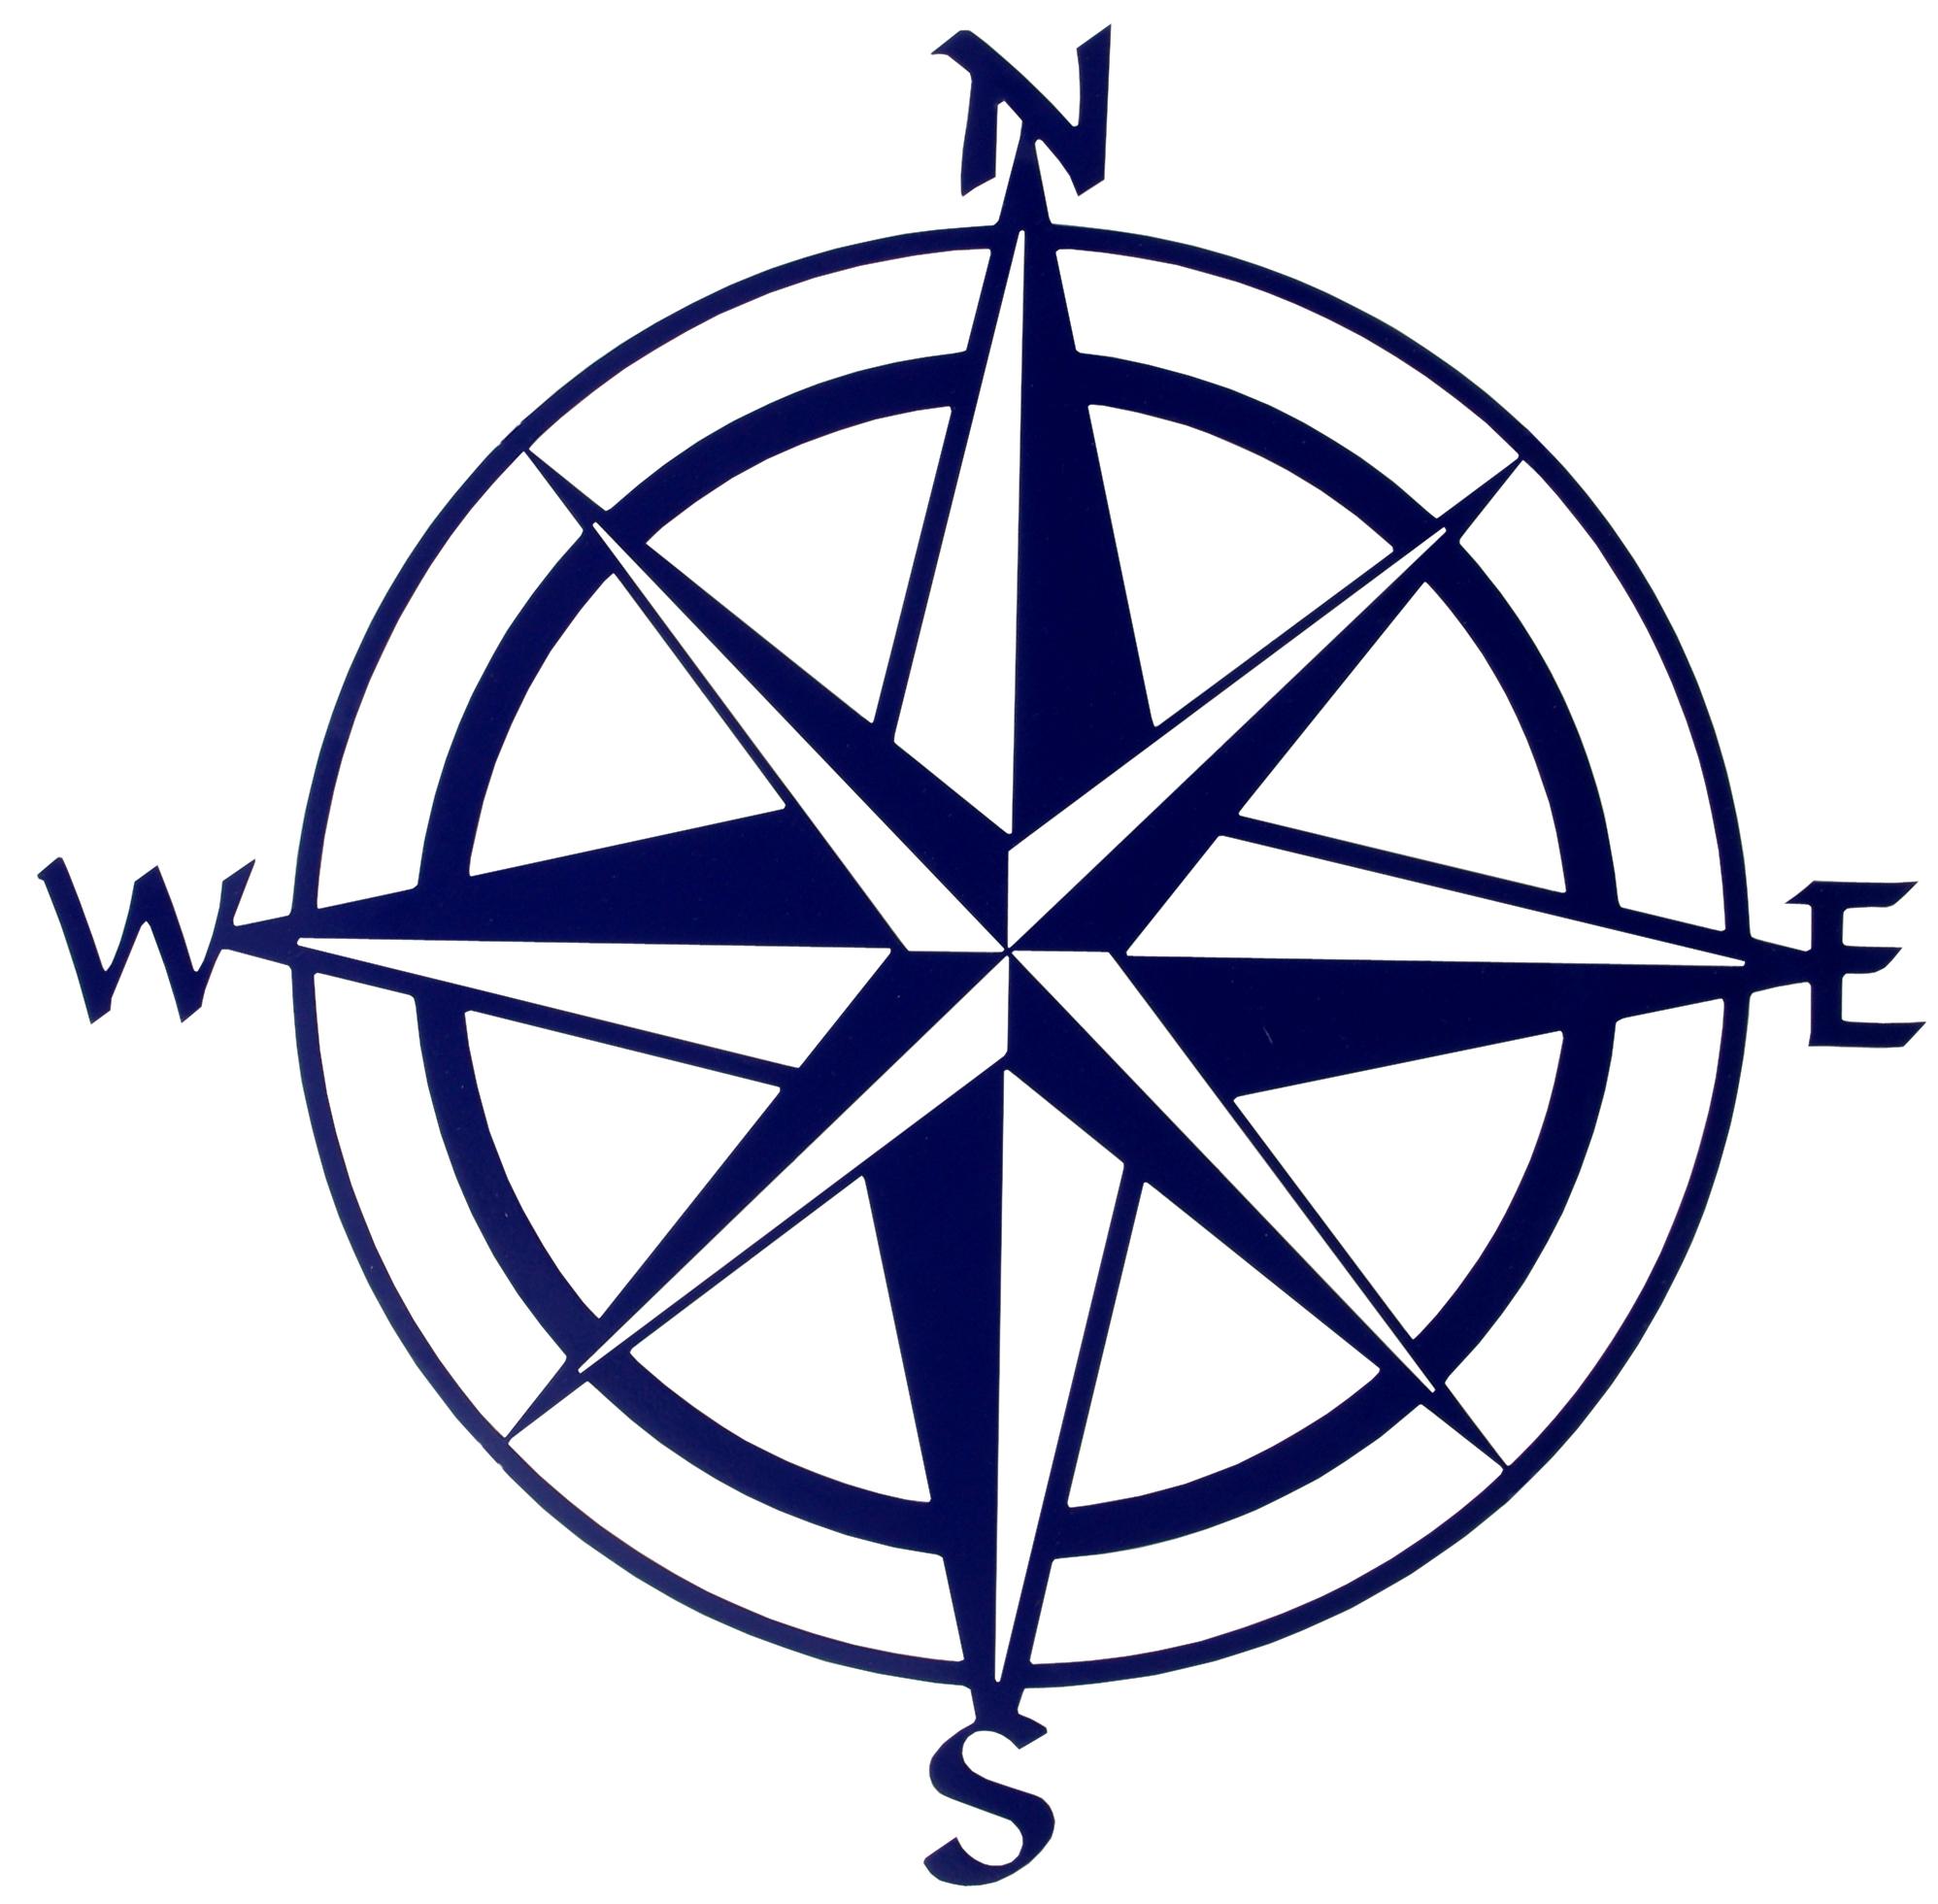 Compass star clipart